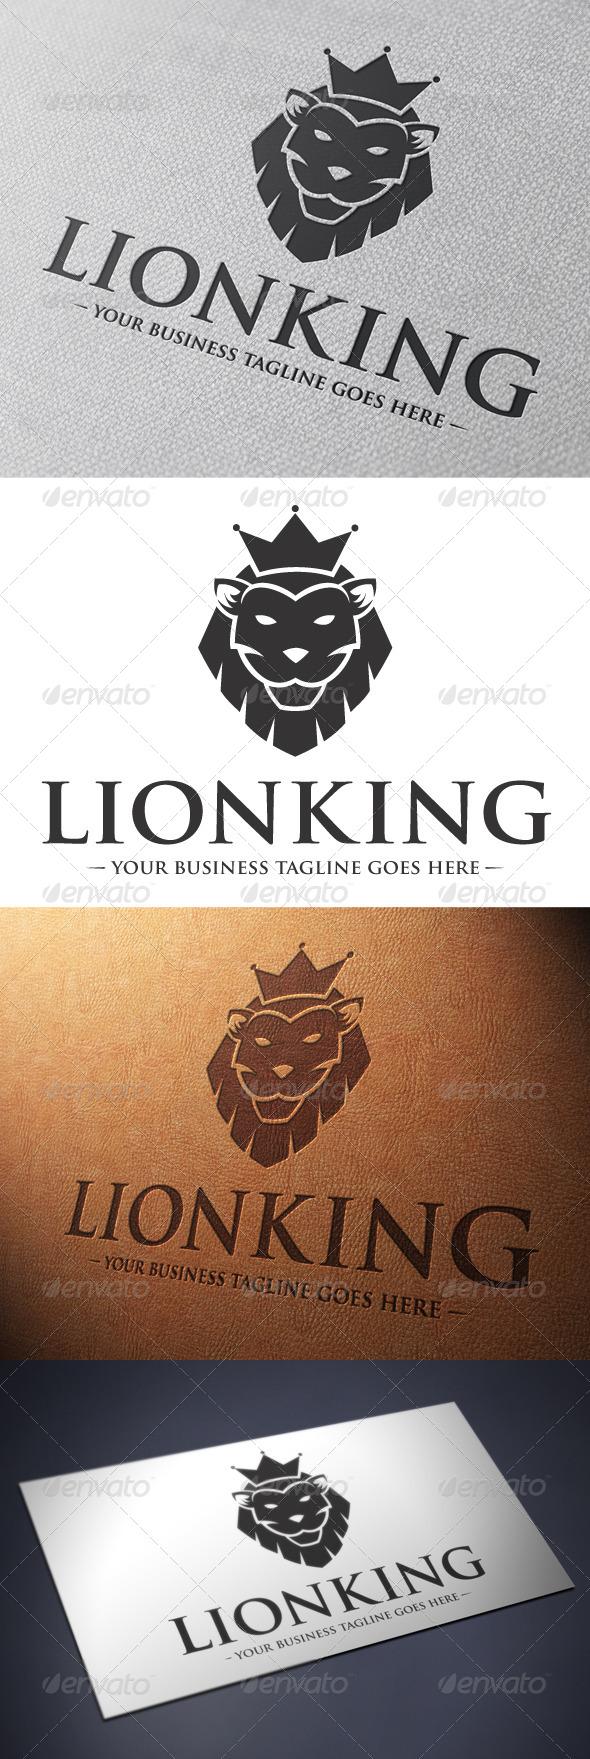 Lion King Logo Template - Animals Logo Templates